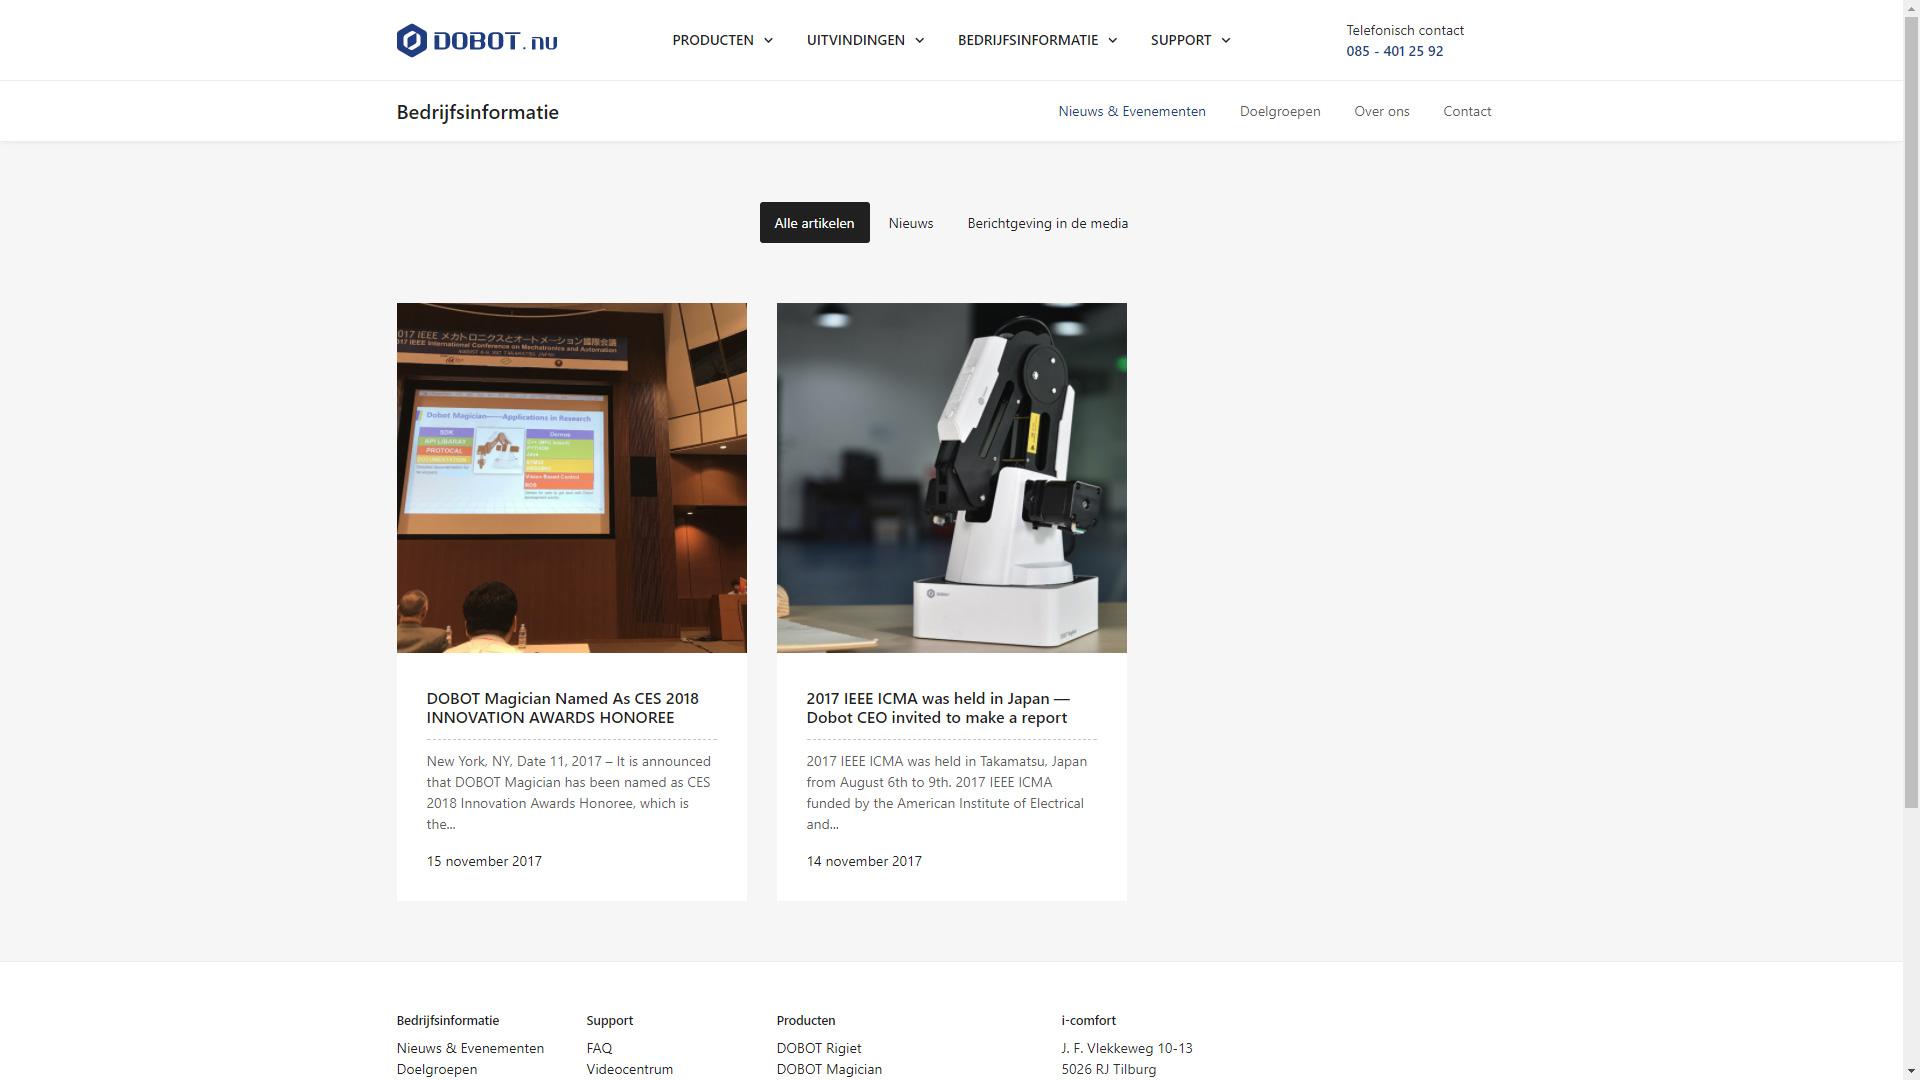 DOBOT.nu - Nieuwsoverzicht